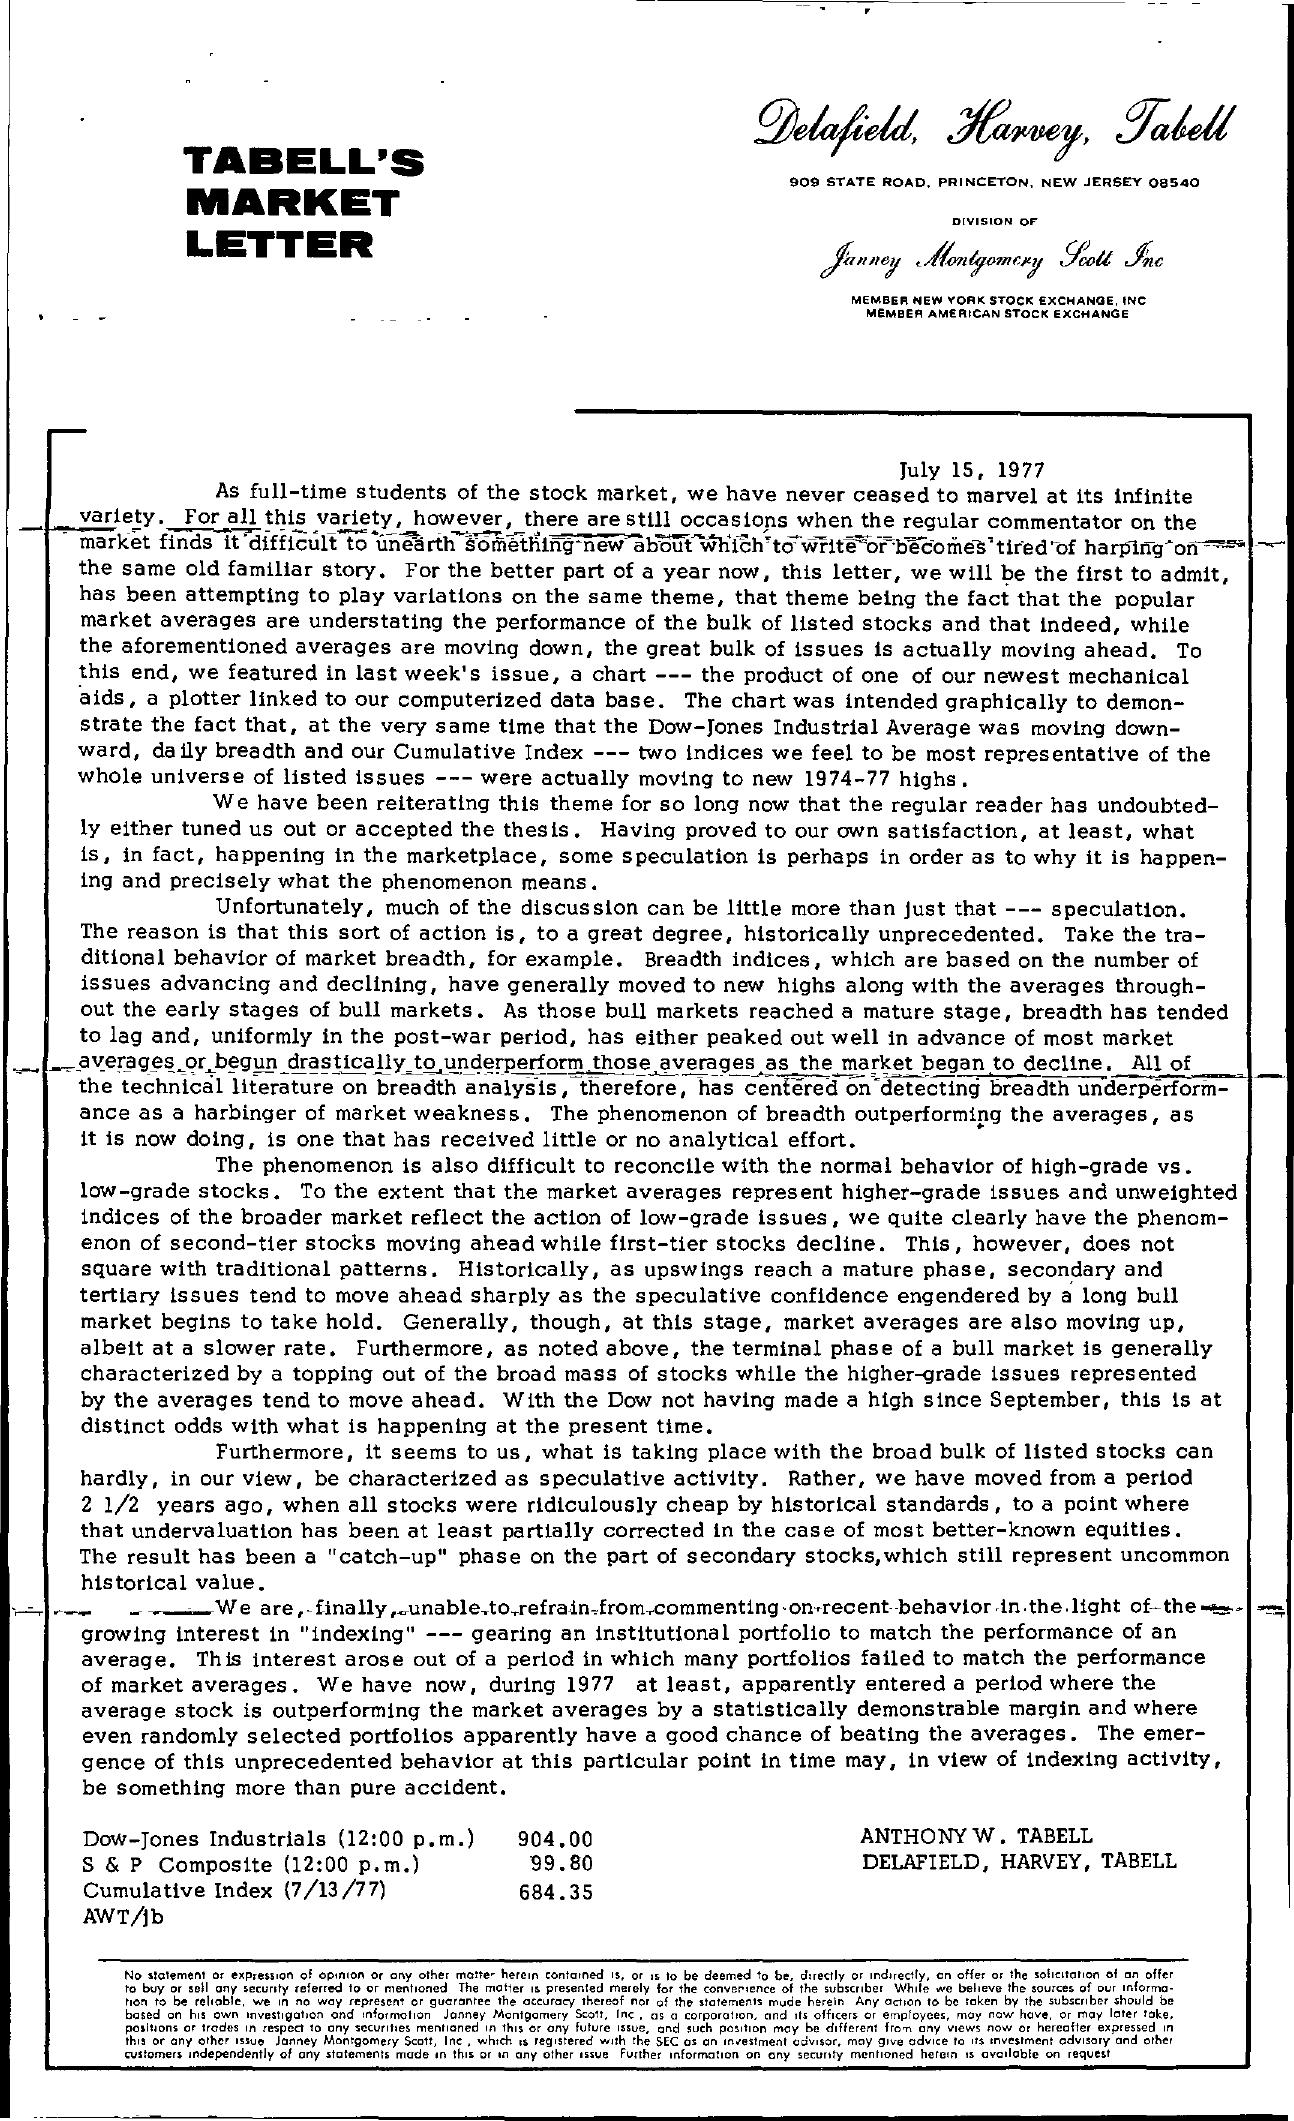 Tabell's Market Letter - July 15, 1977